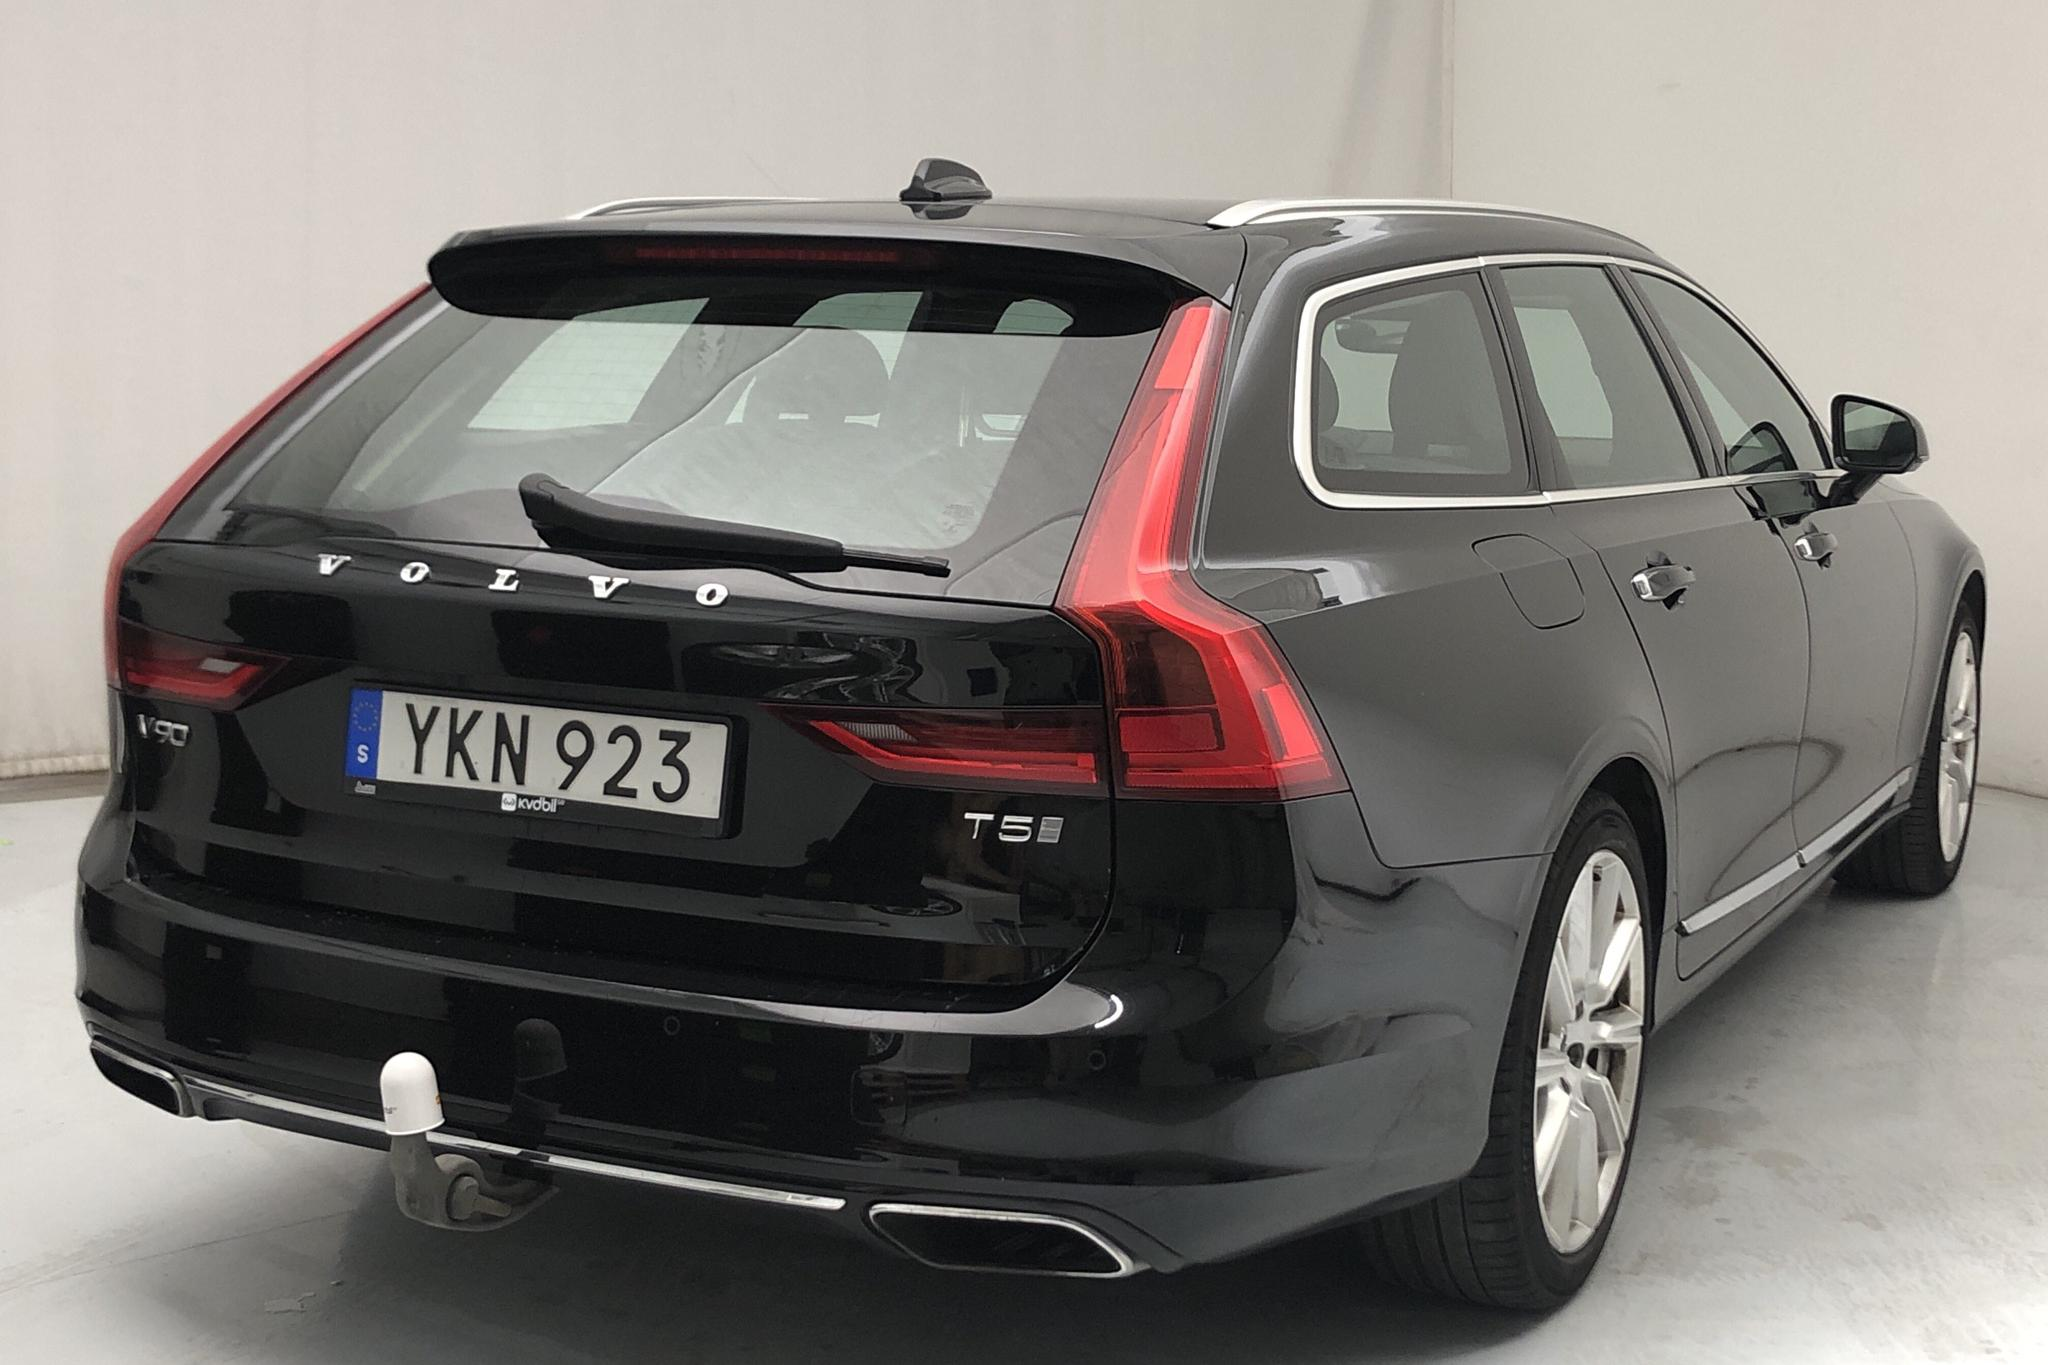 Volvo V90 T5 (254hk) - 104 350 km - Automatic - black - 2017